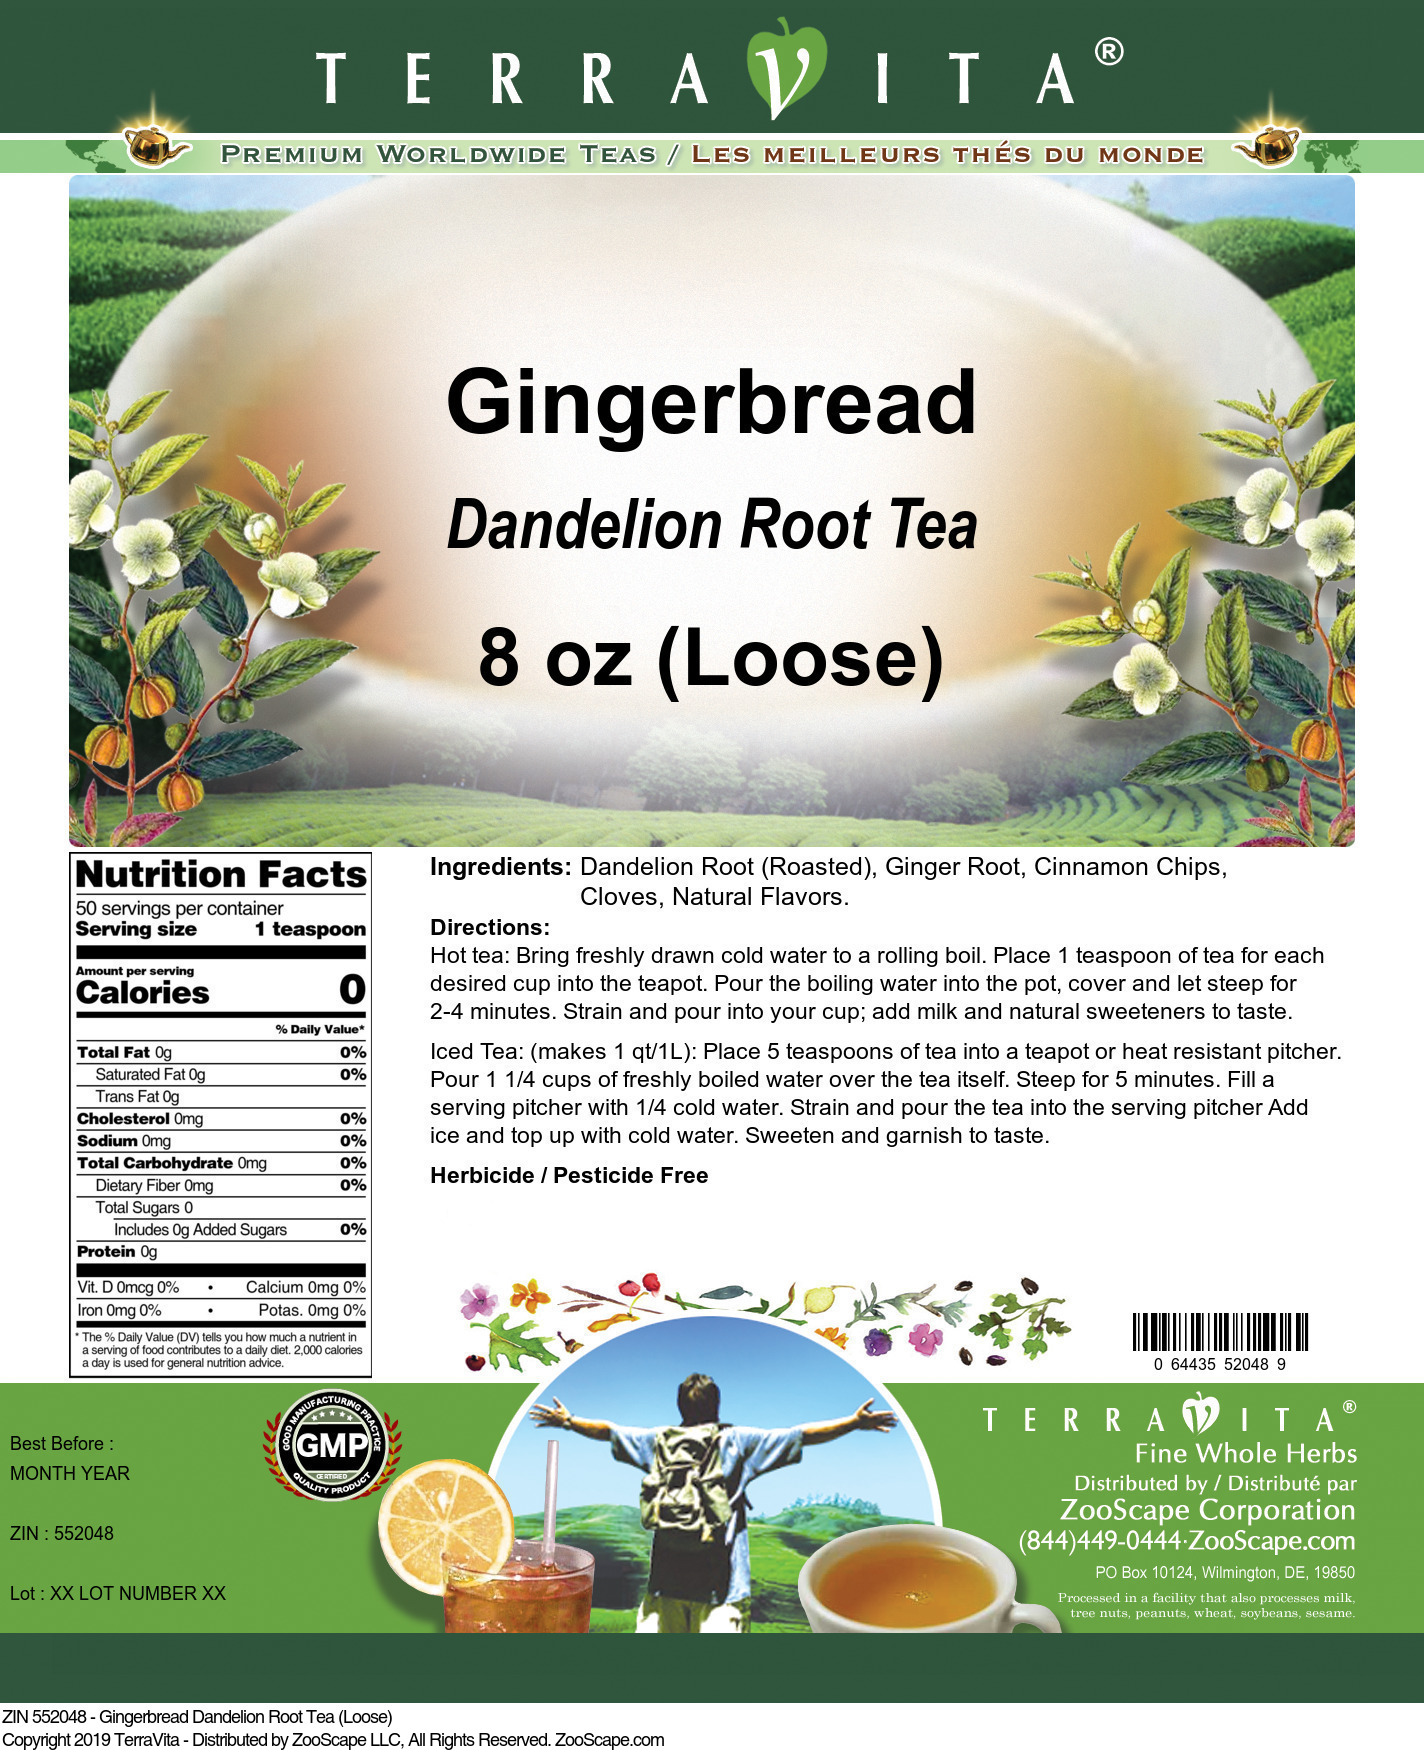 Gingerbread Dandelion Root